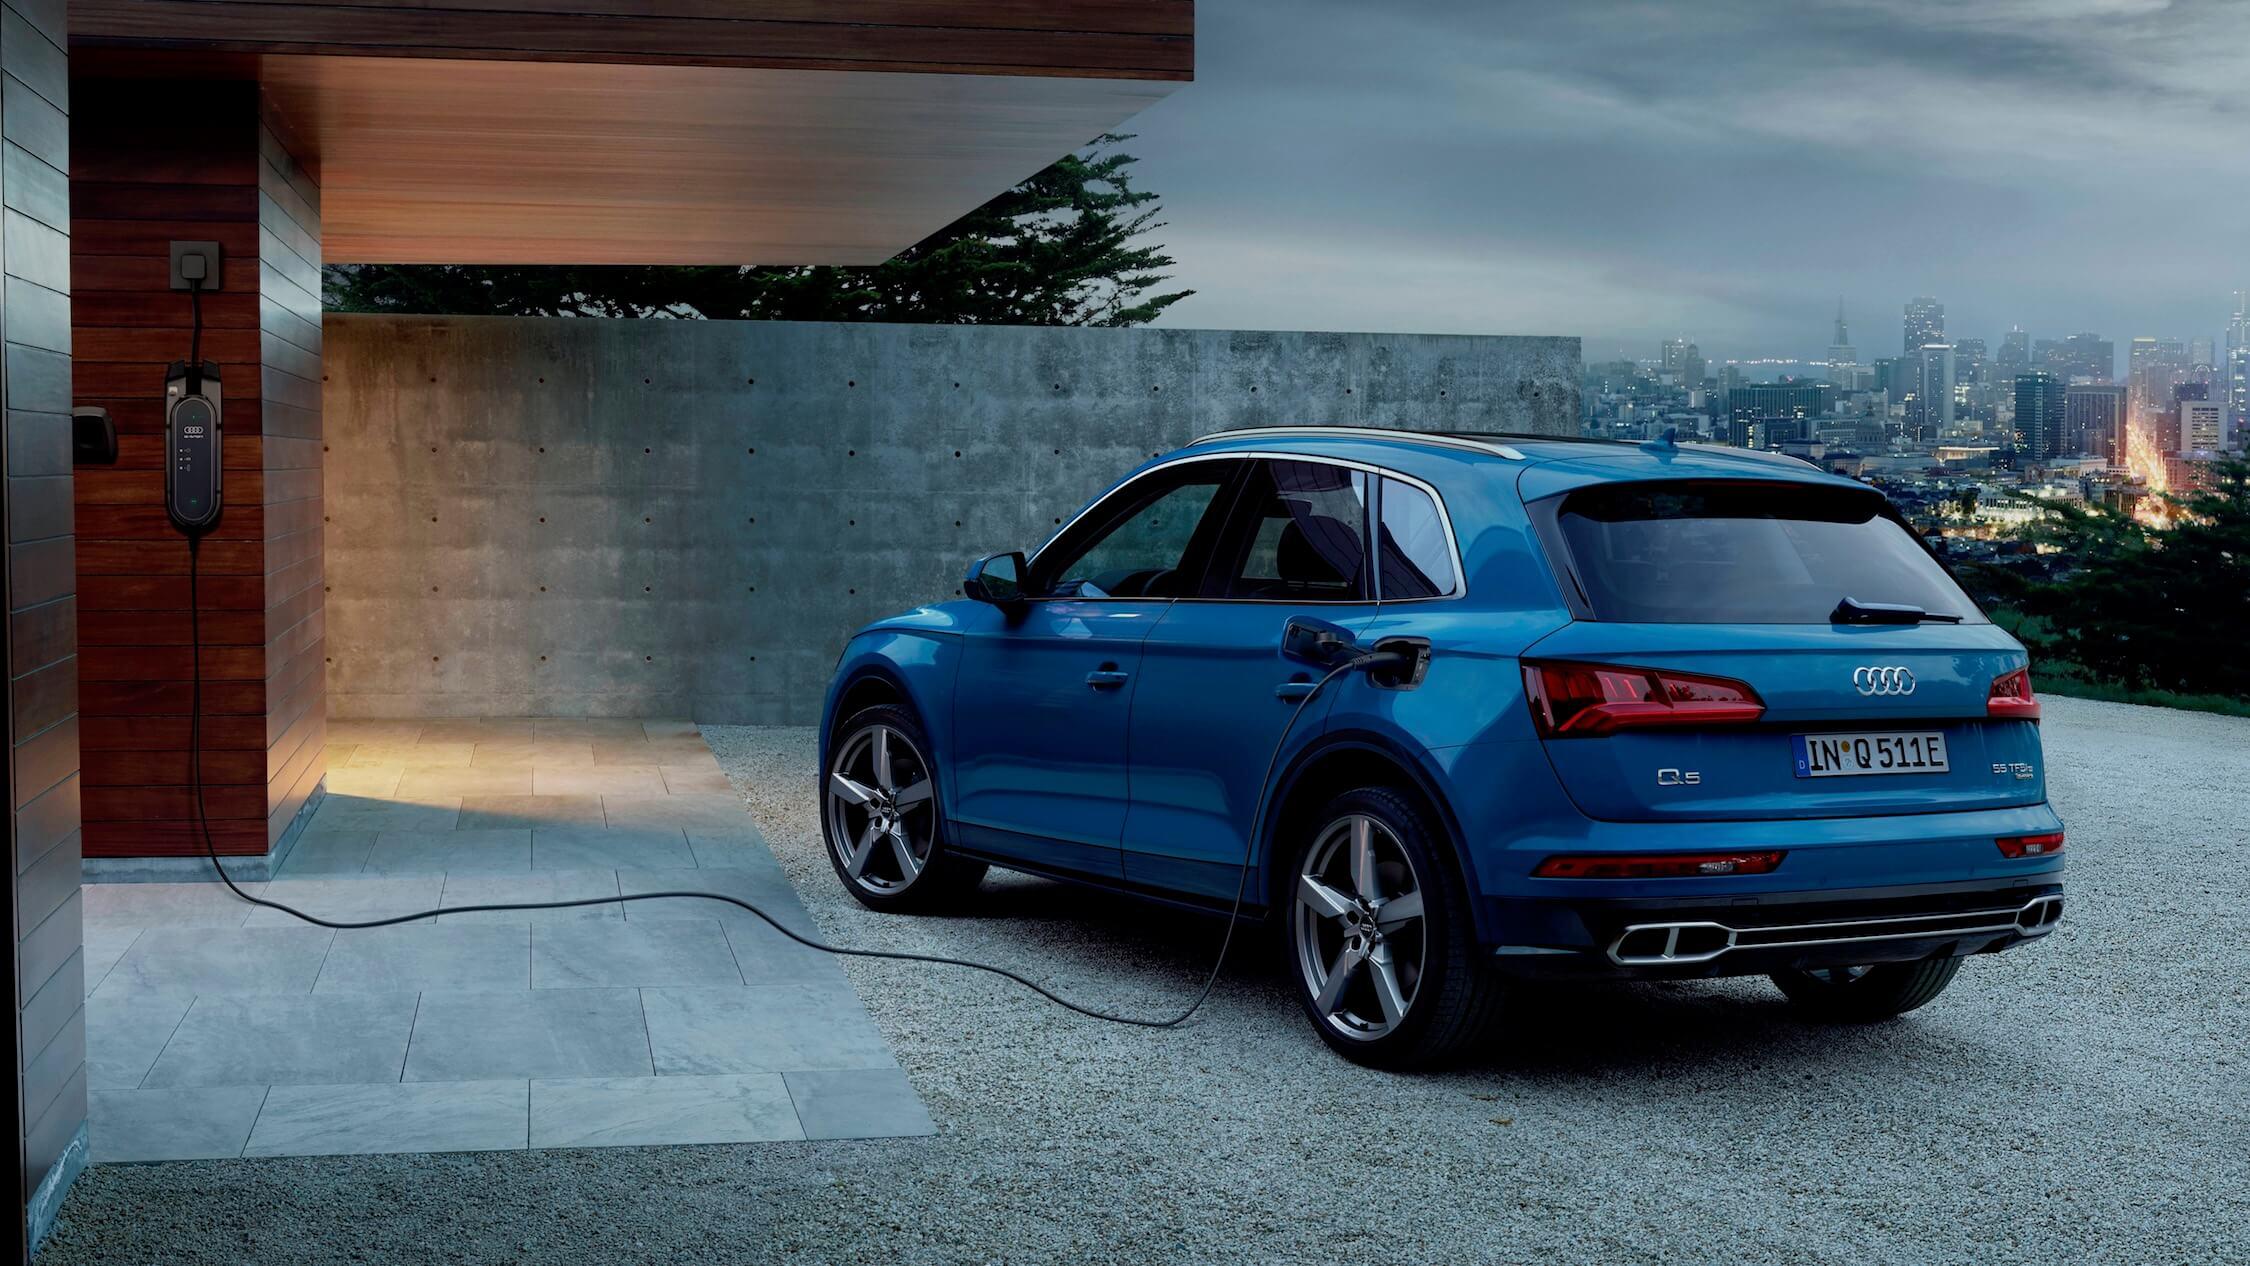 Hybride Audi Q5 opladen